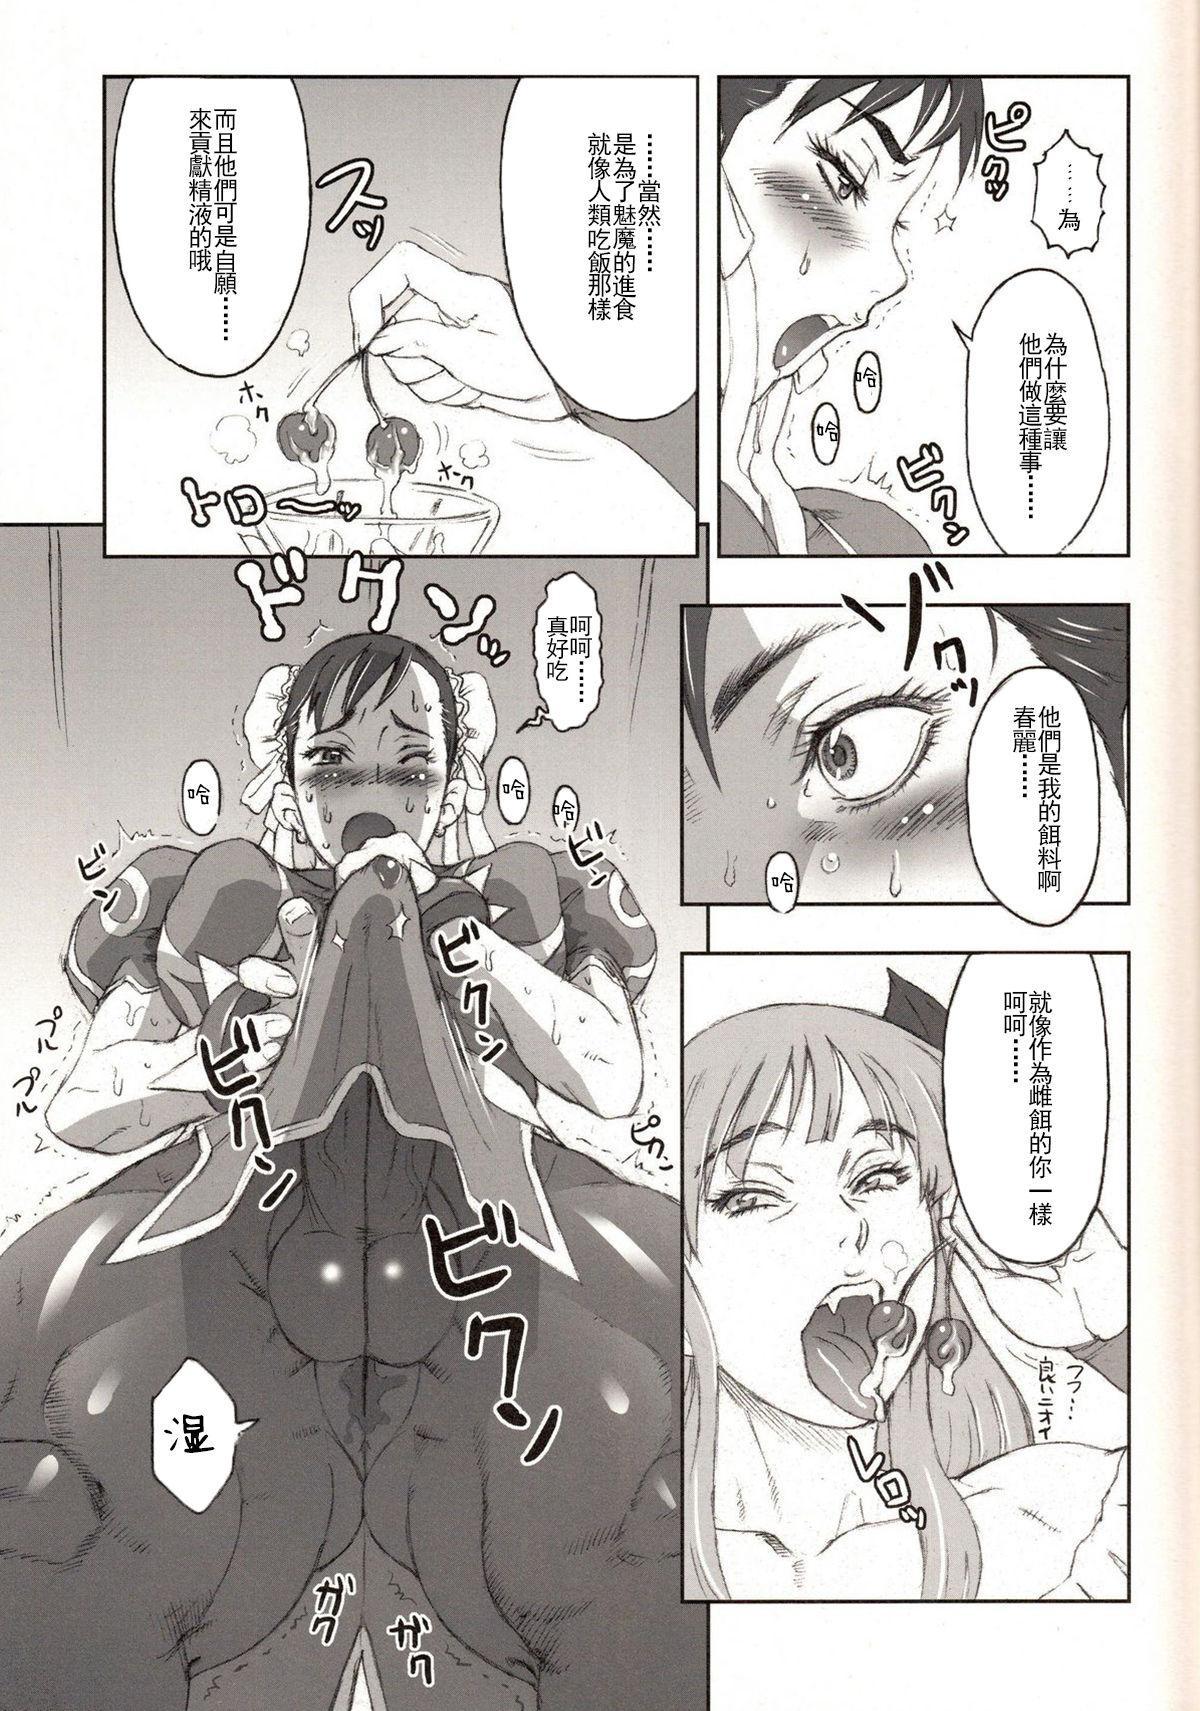 (C70) [Niku Ringo (Kakugari Kyoudai)] NIPPON Onna HEROINE 2 (Darkstalkers, Street Fighter II)[Chinese]【不可视汉化】 9